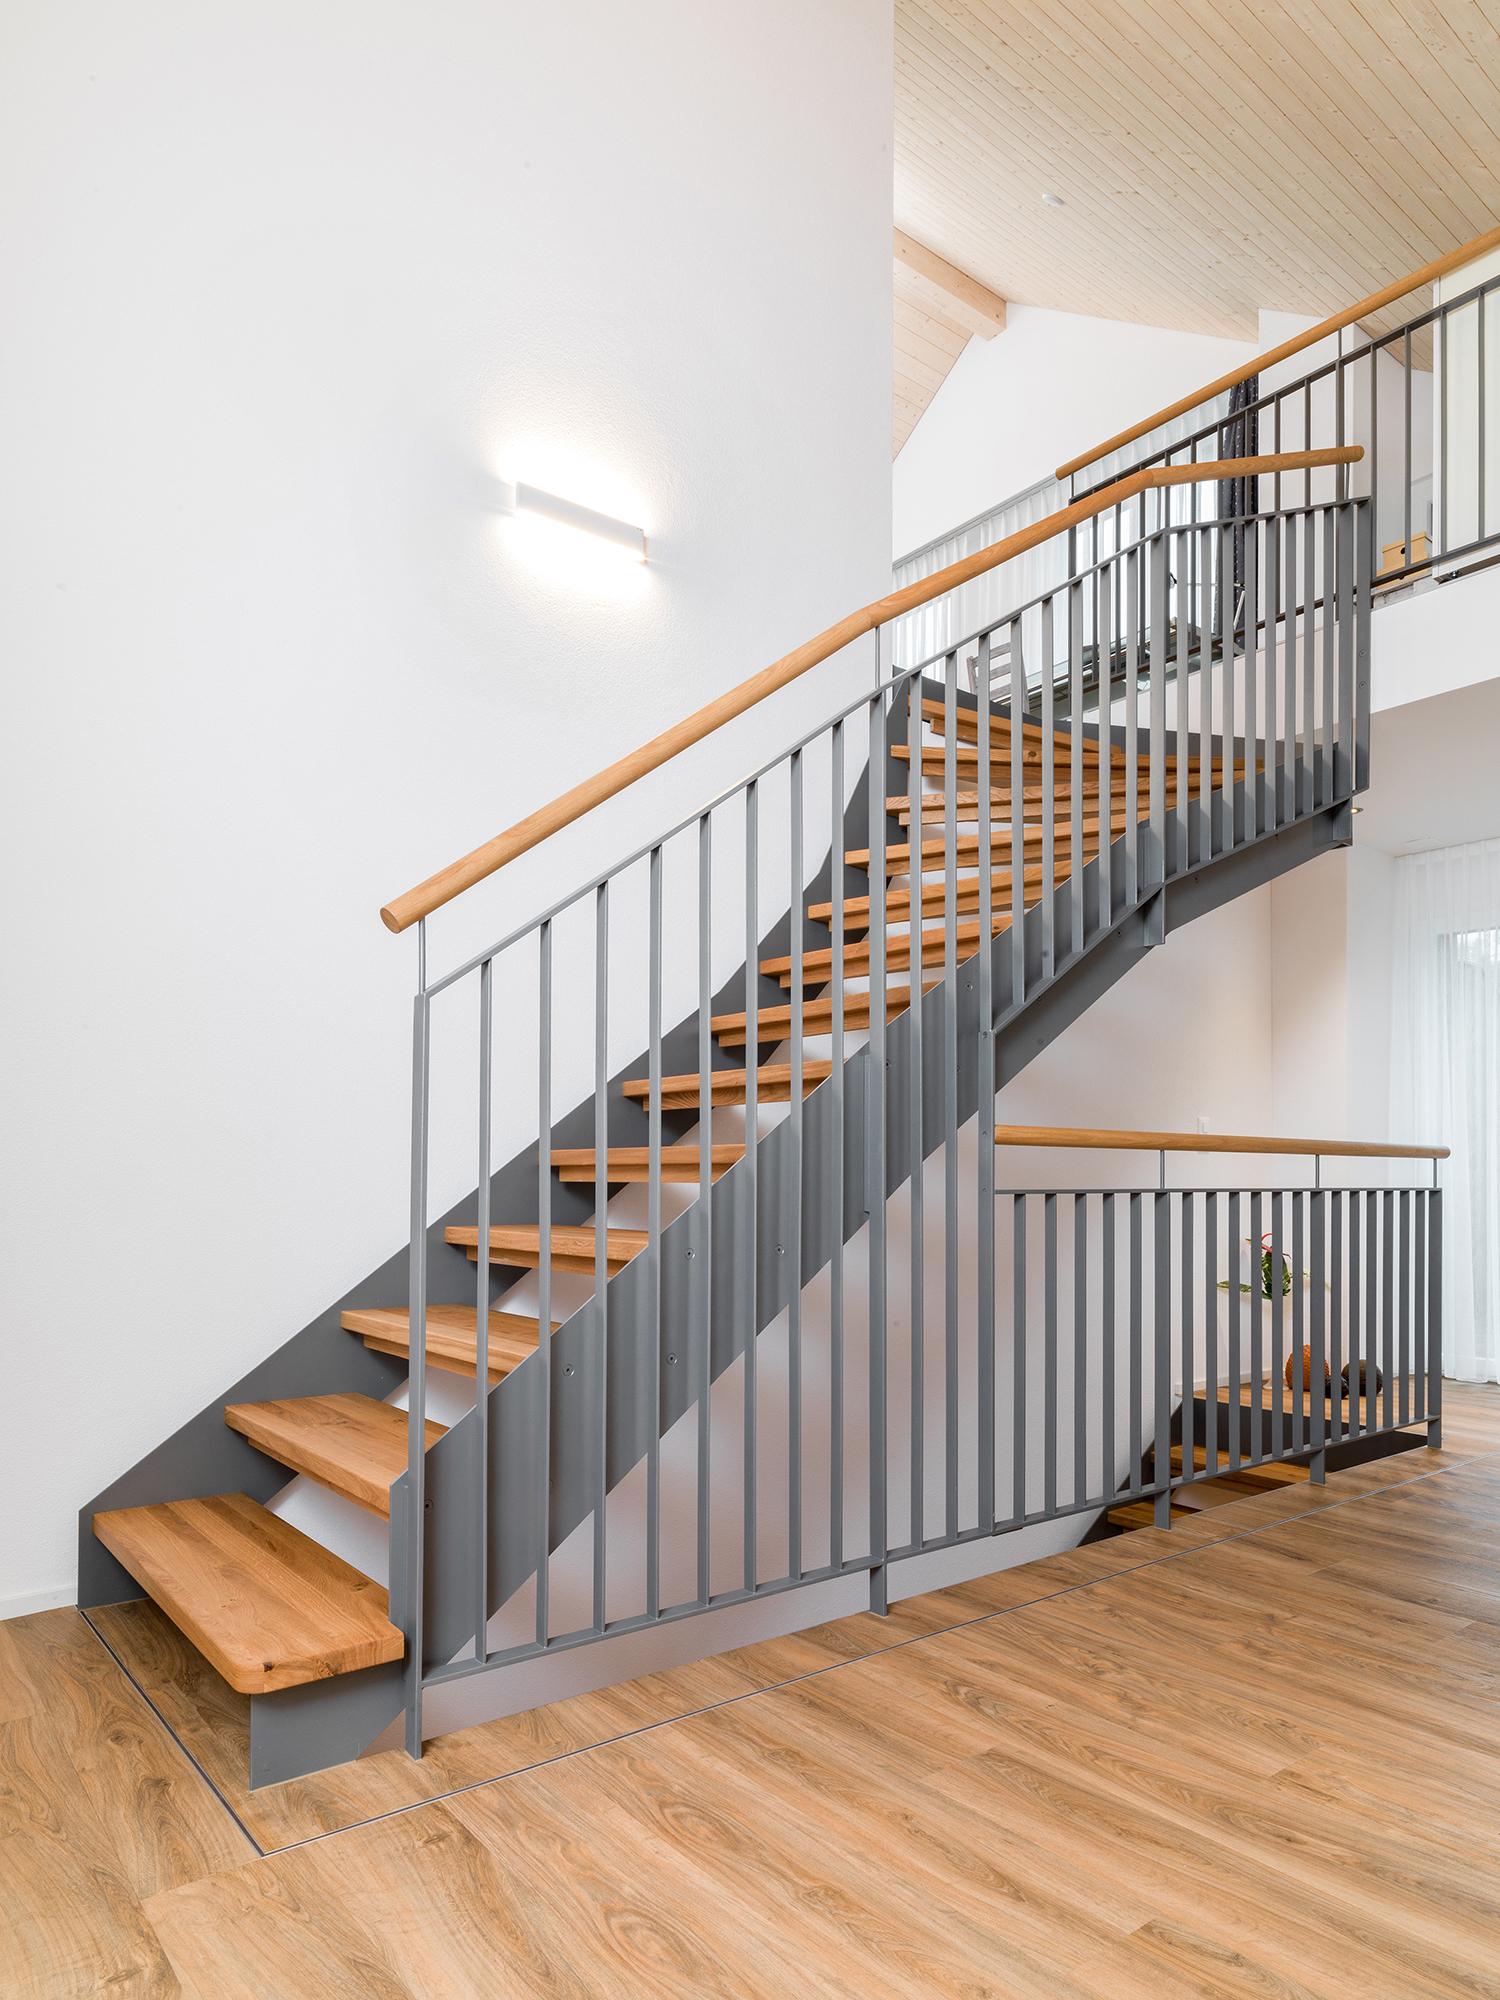 Stair Image 1290